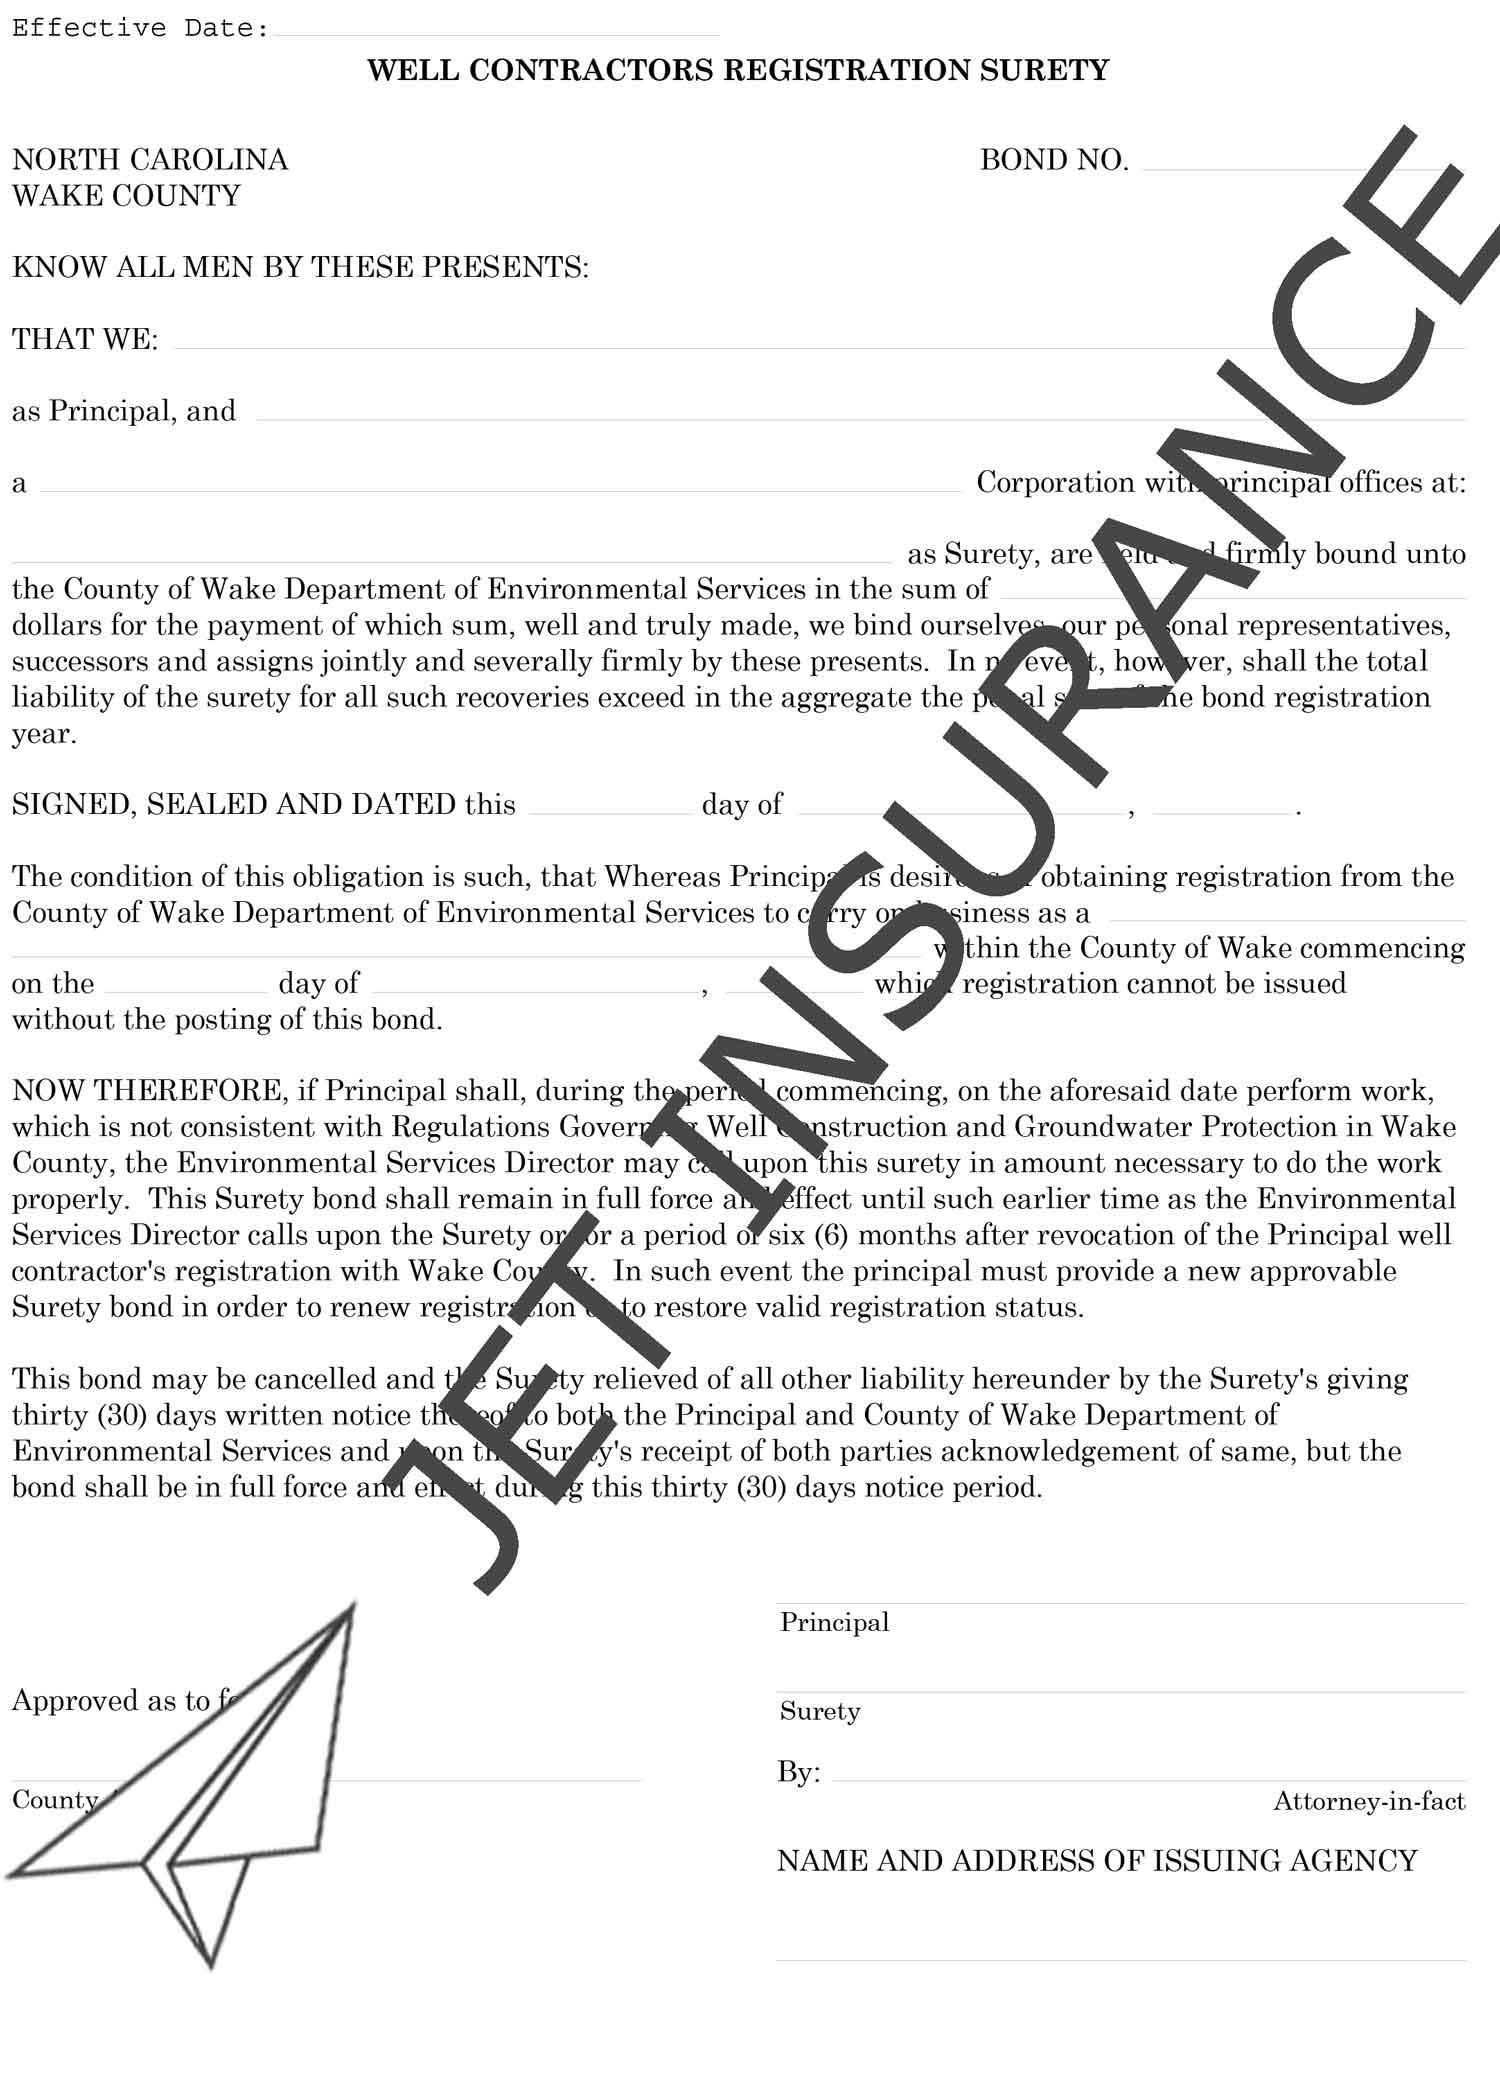 Wake County North Carolina Well Contractor Bond Form